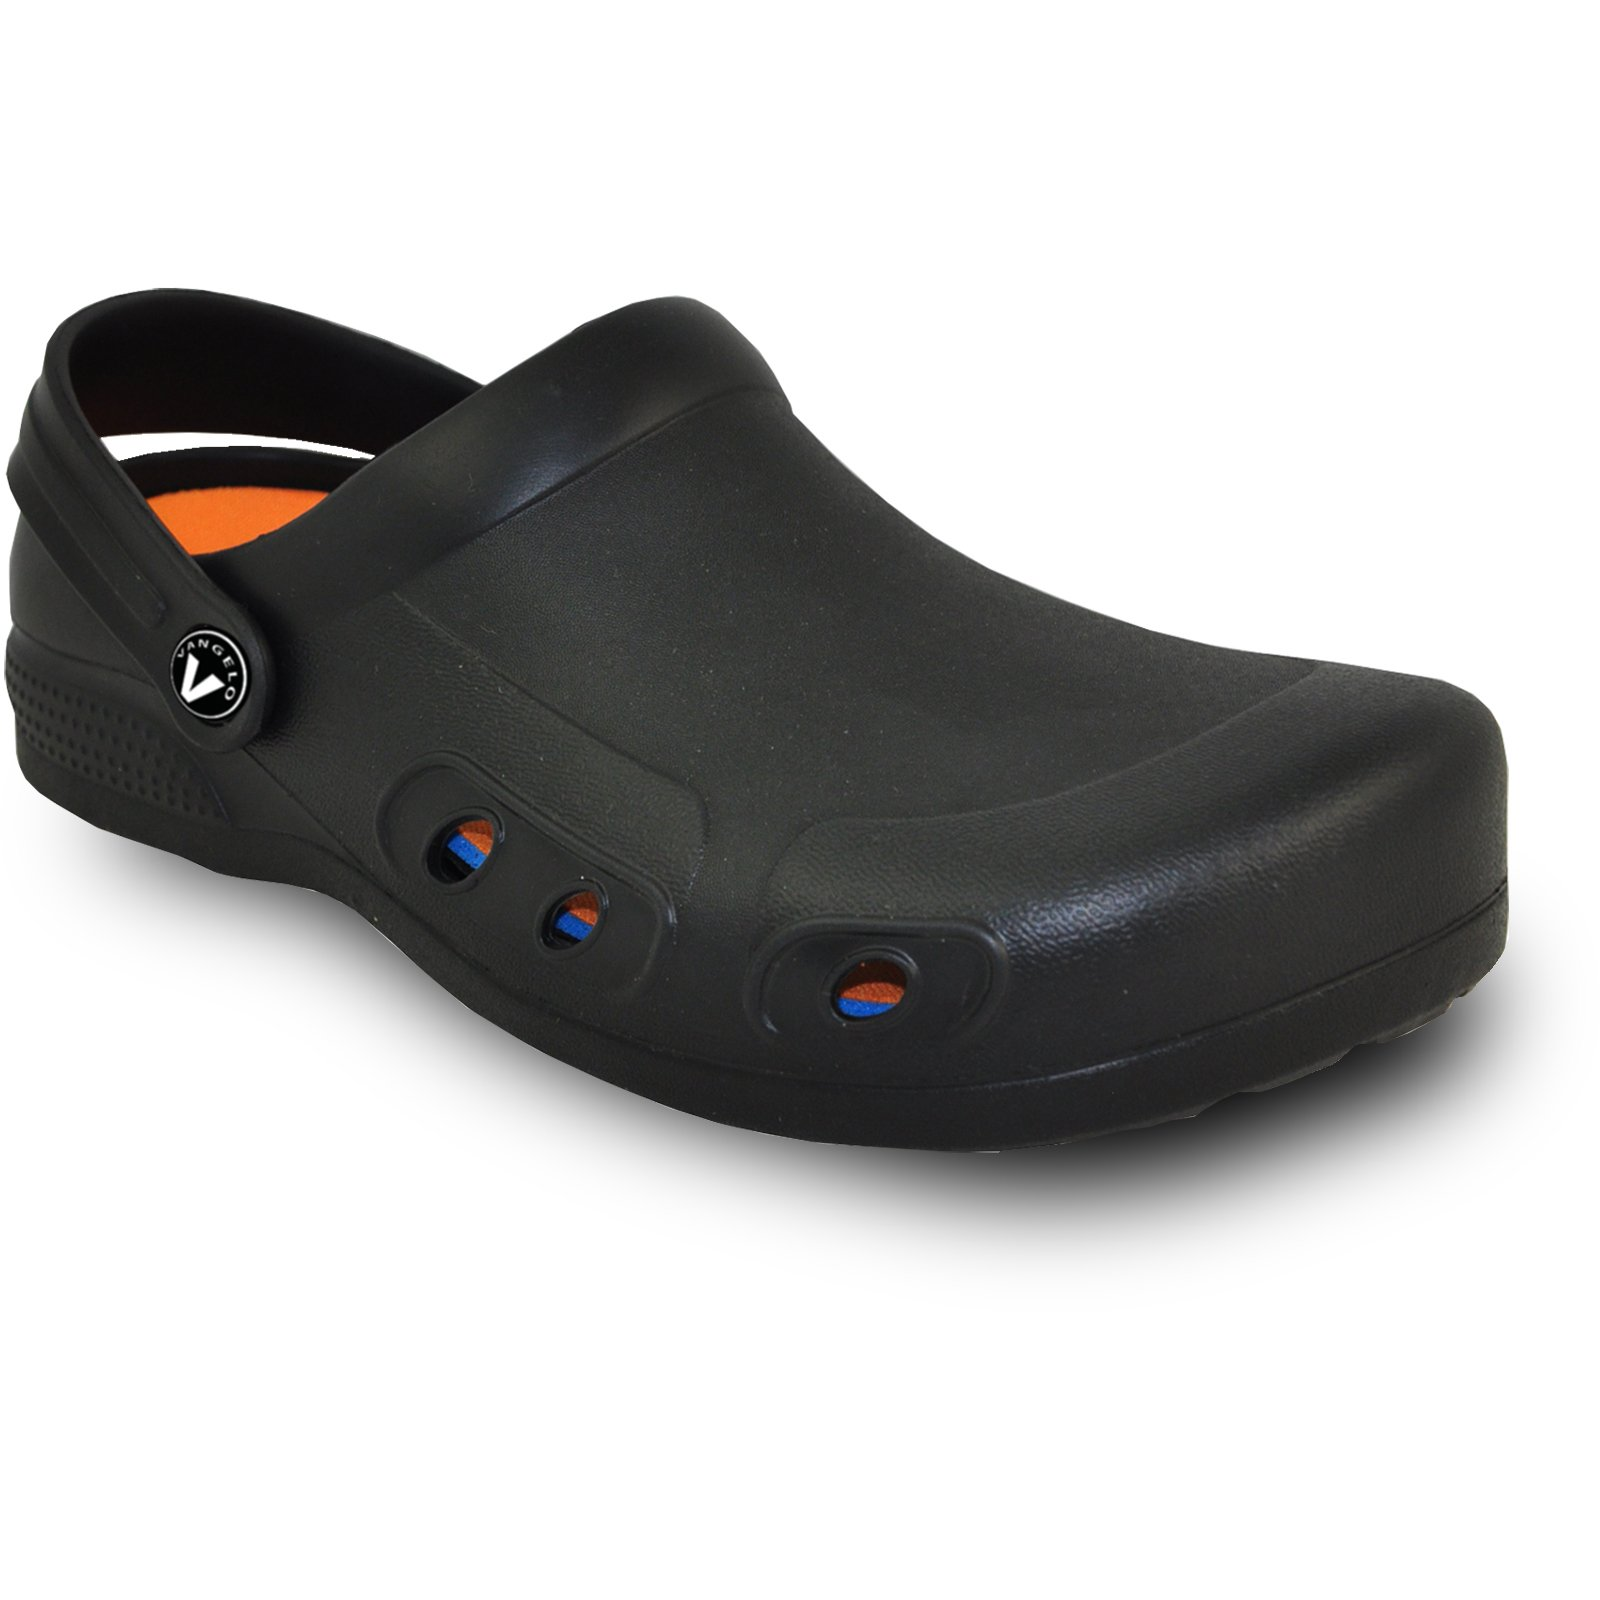 VANGELO Professional Slip Resistant Clog Unisex Work Shoe Ritz Black by VANGELO